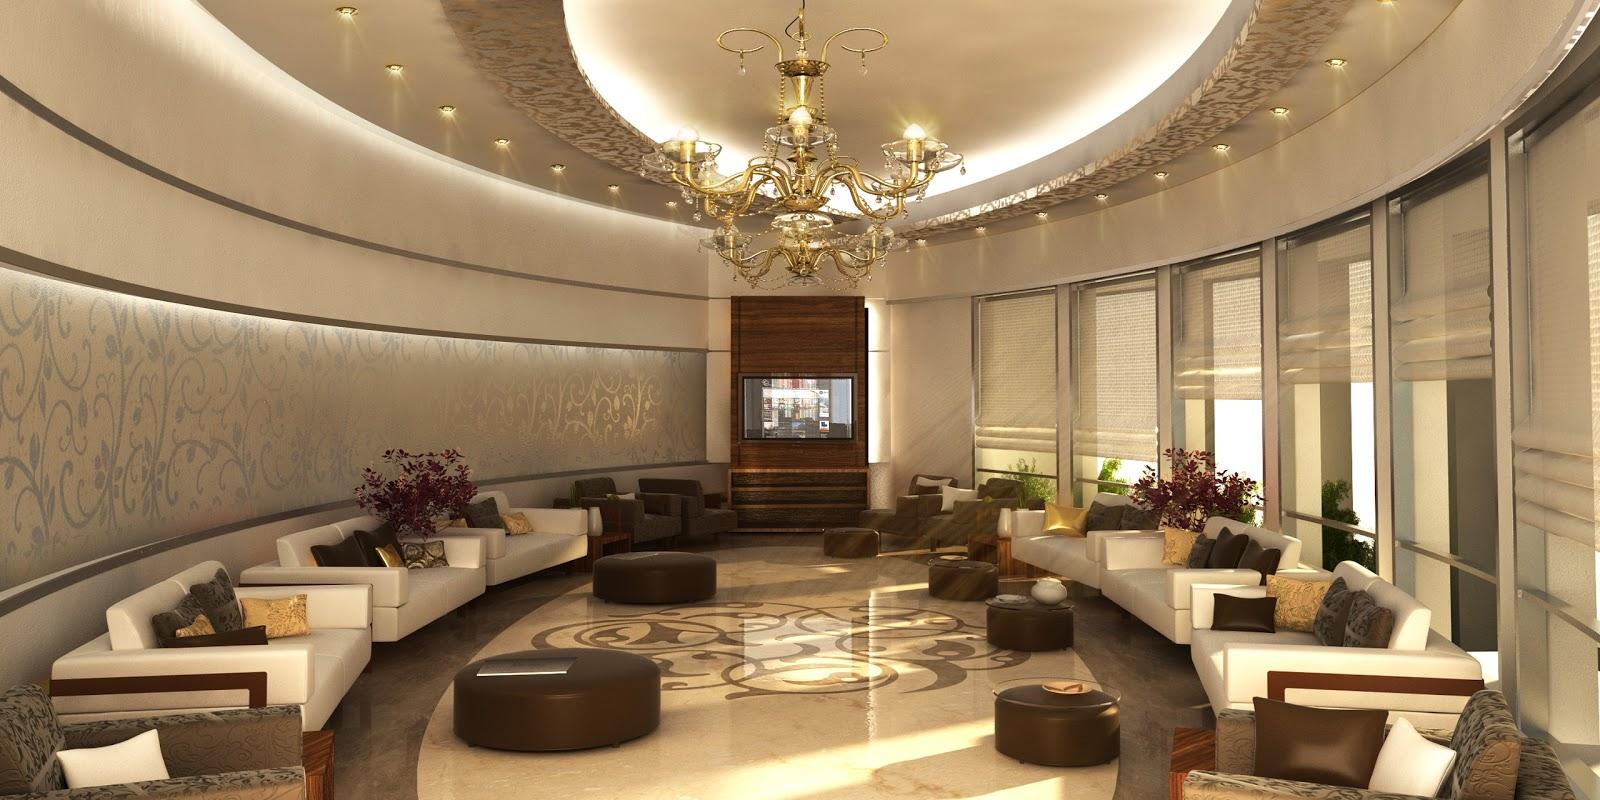 Asem Walid Jedaee Palace Interior Design